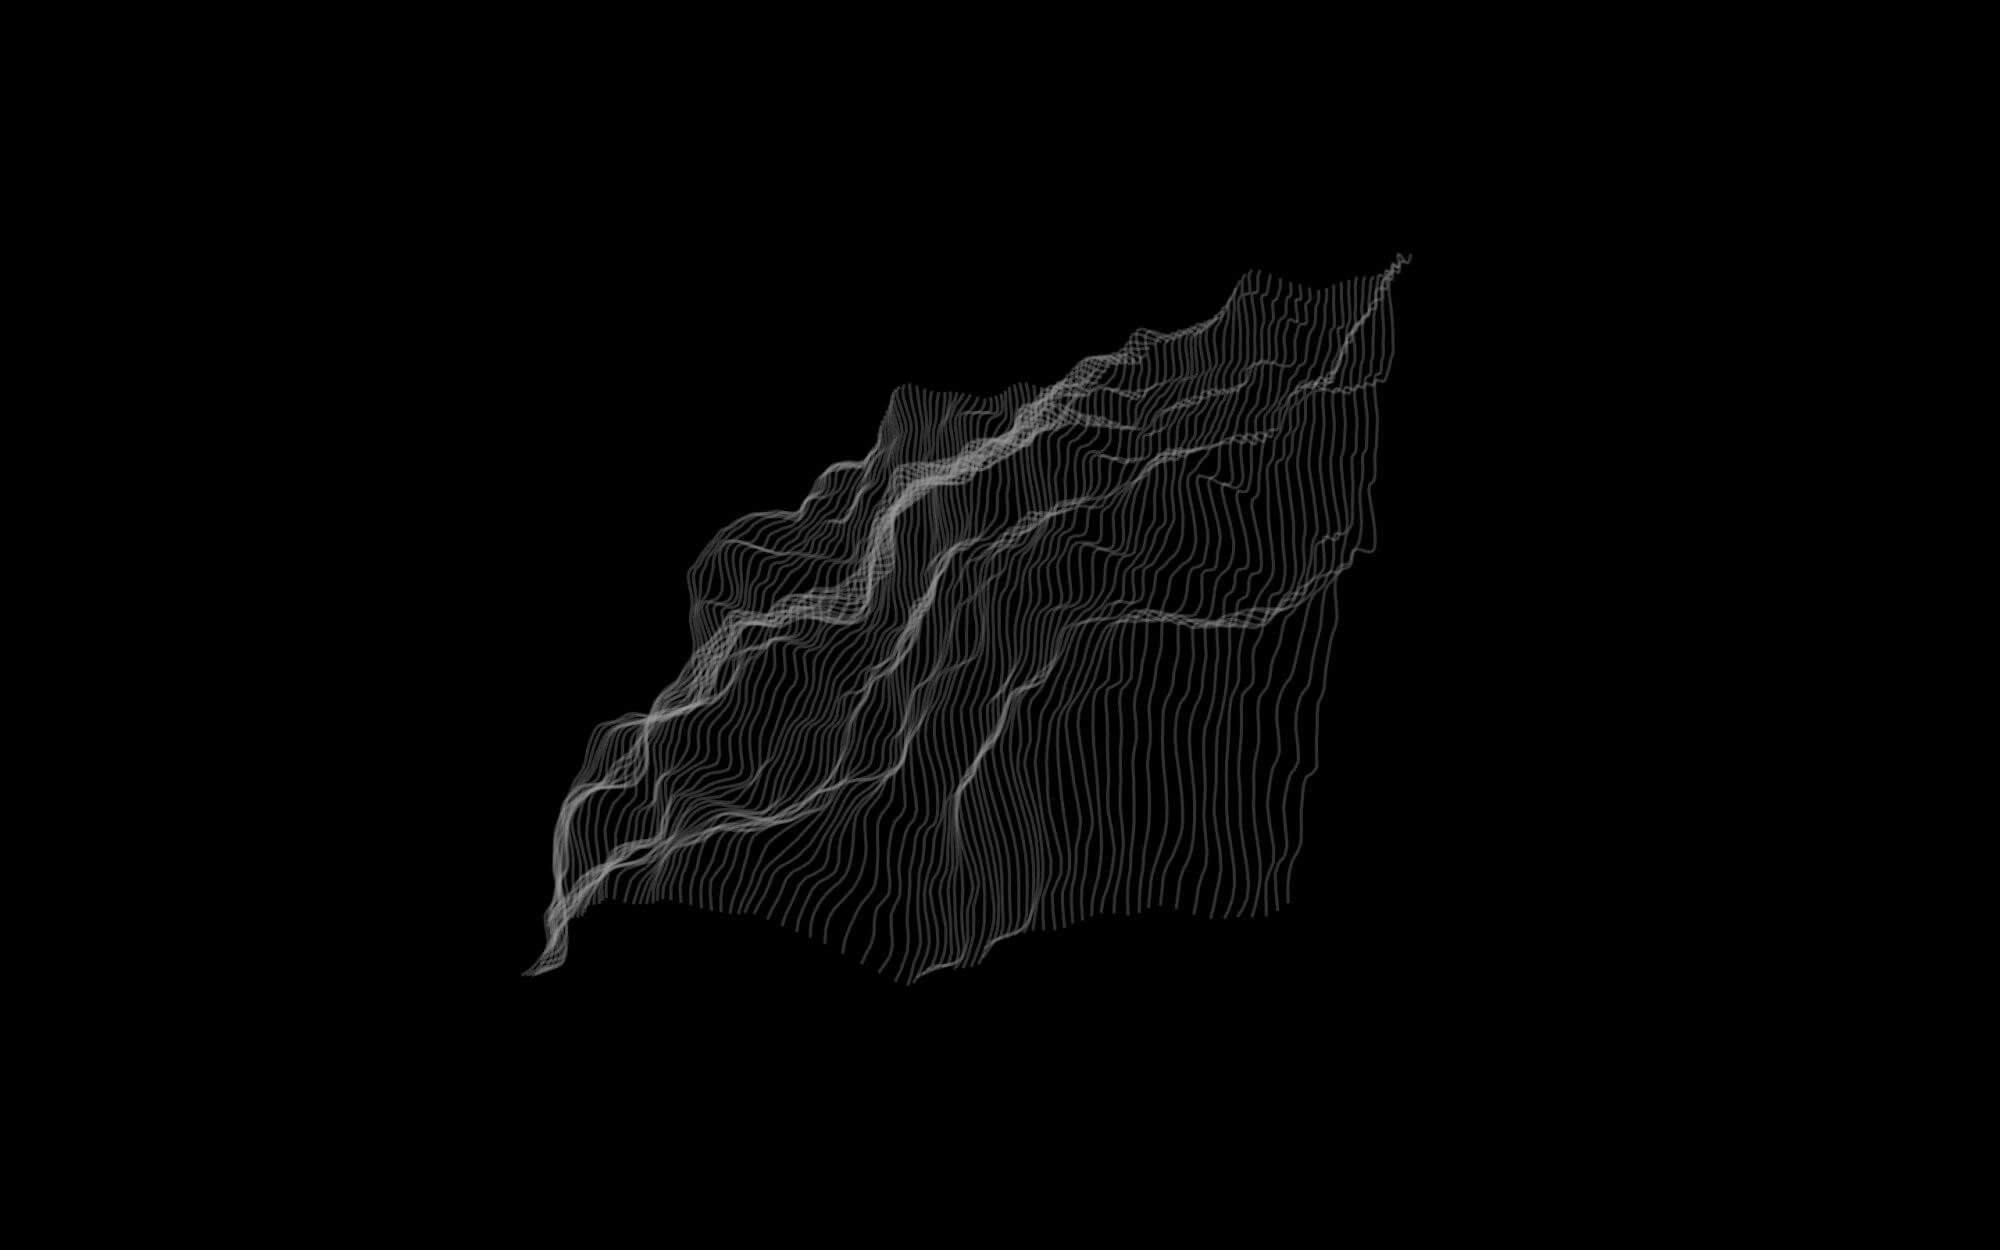 wave18